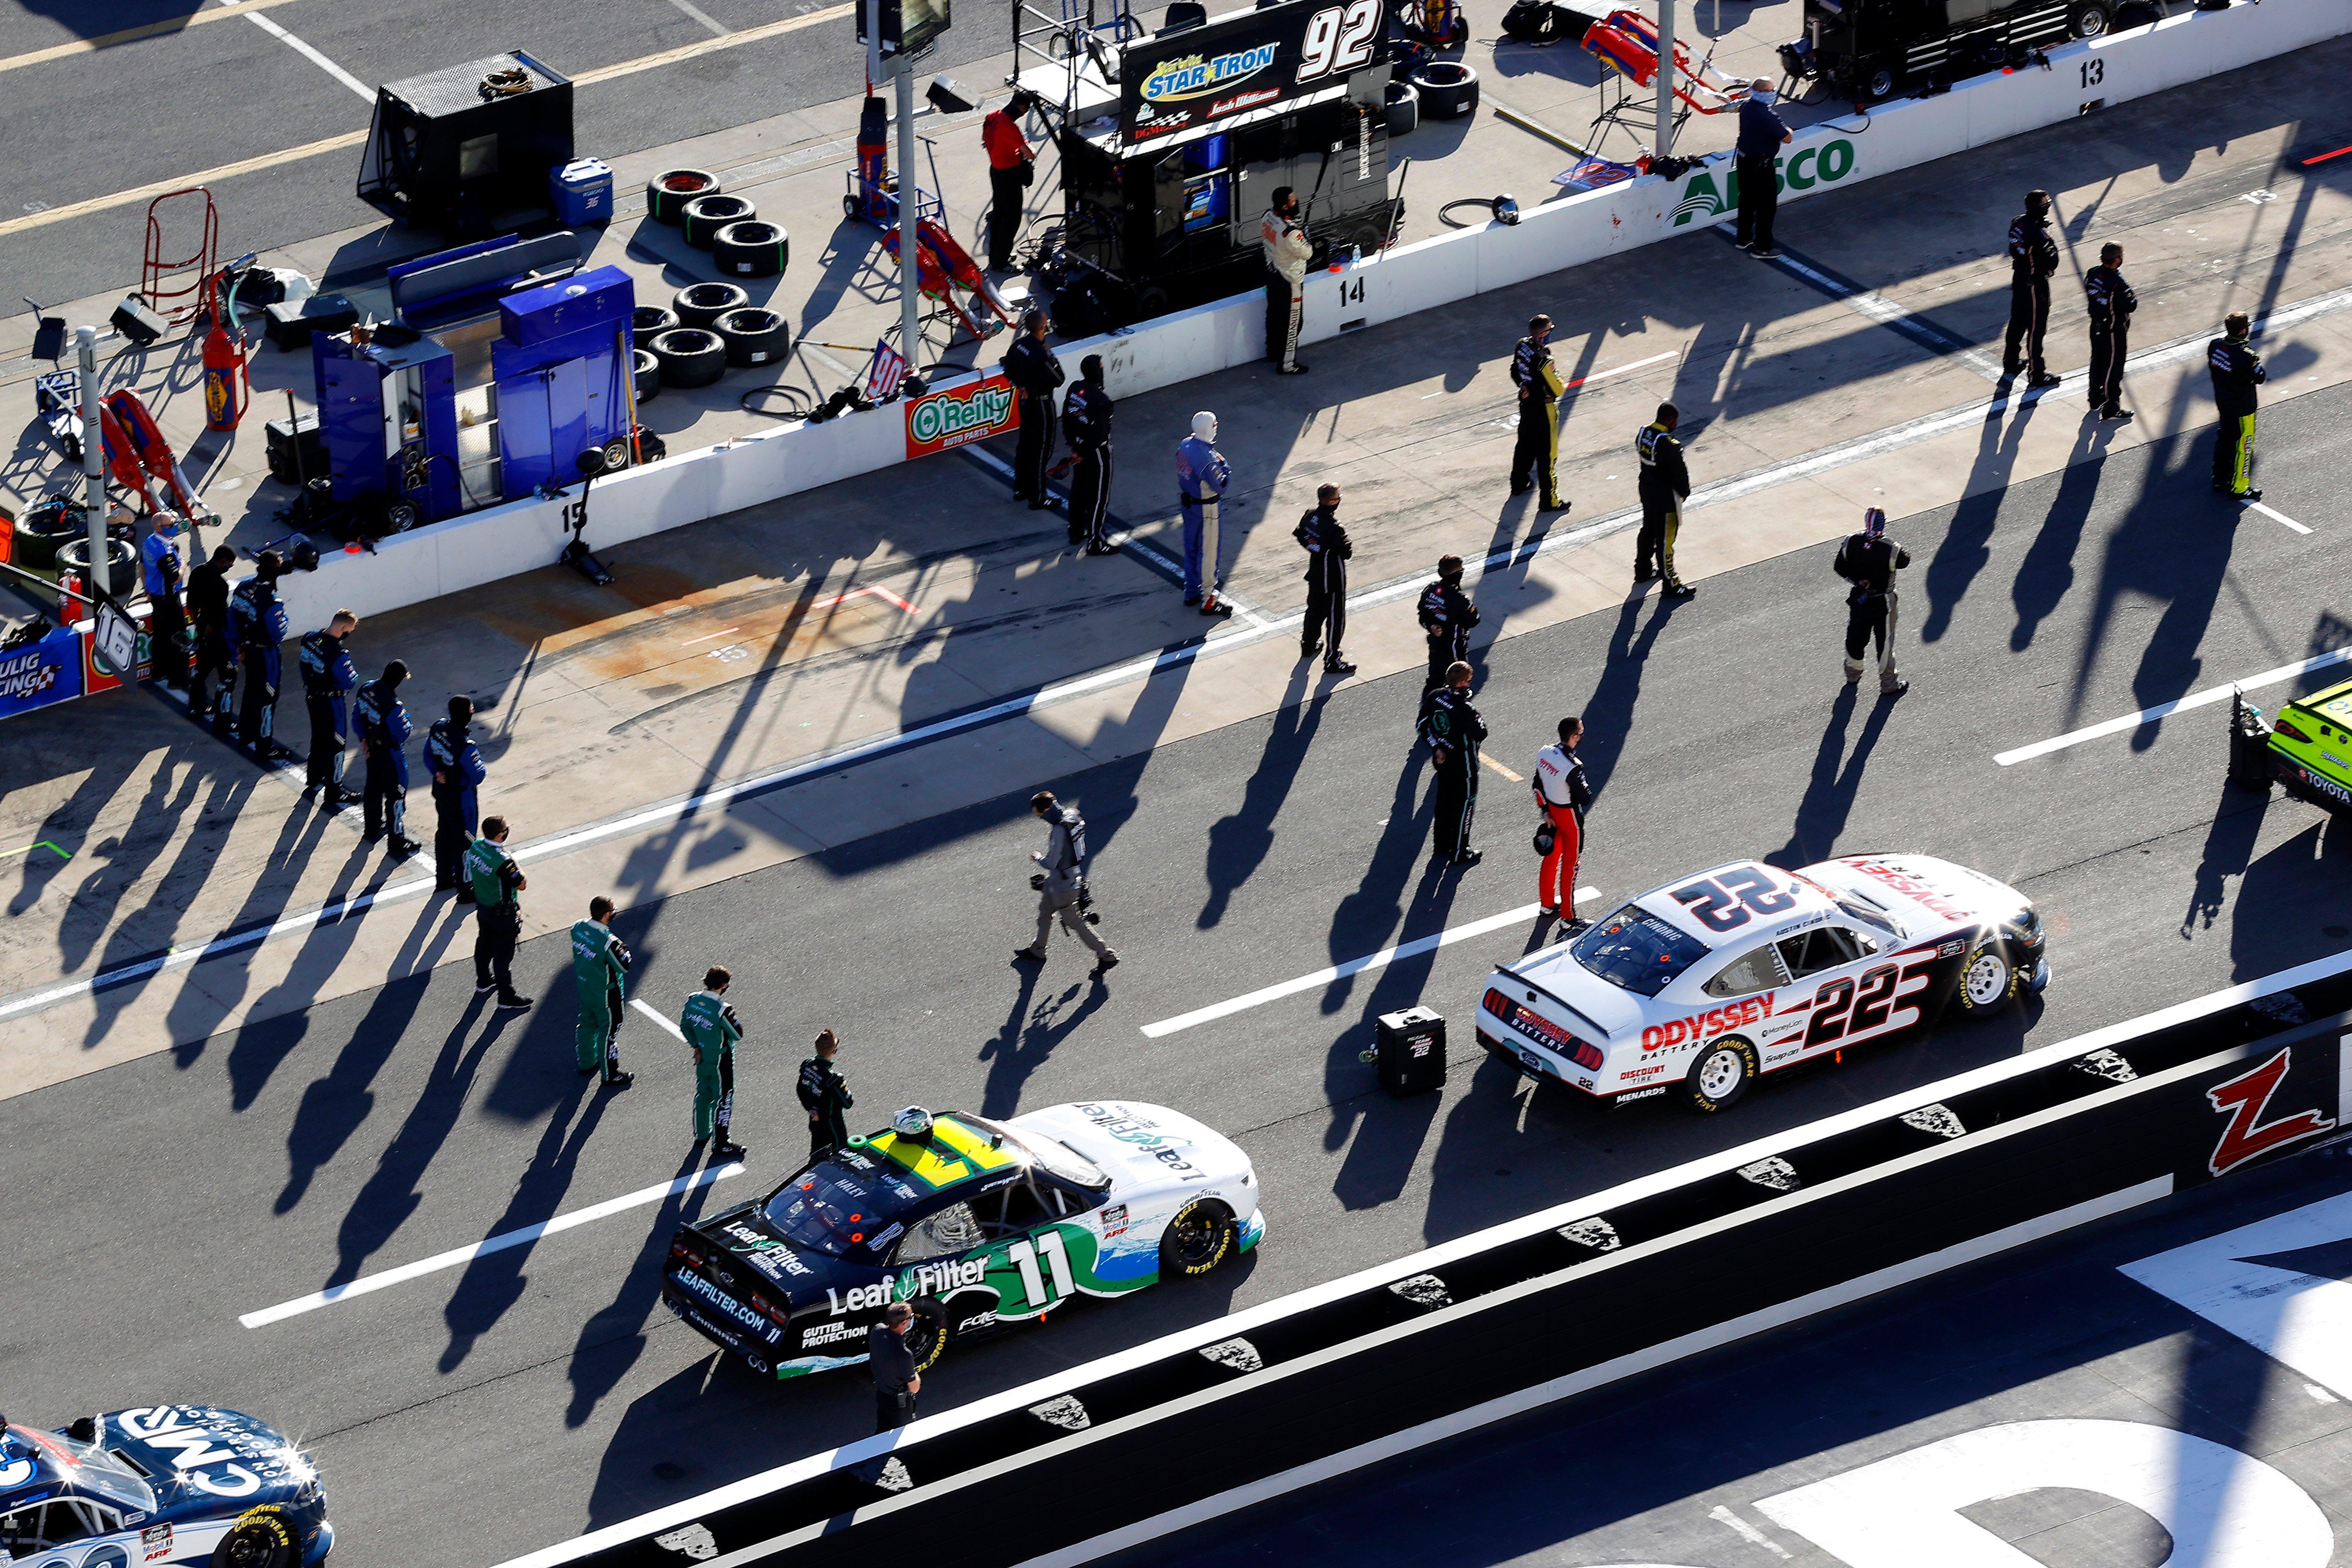 Bristol Starting Lineup: September 18, 2020 (NASCAR Xfinity Series) - Racing News